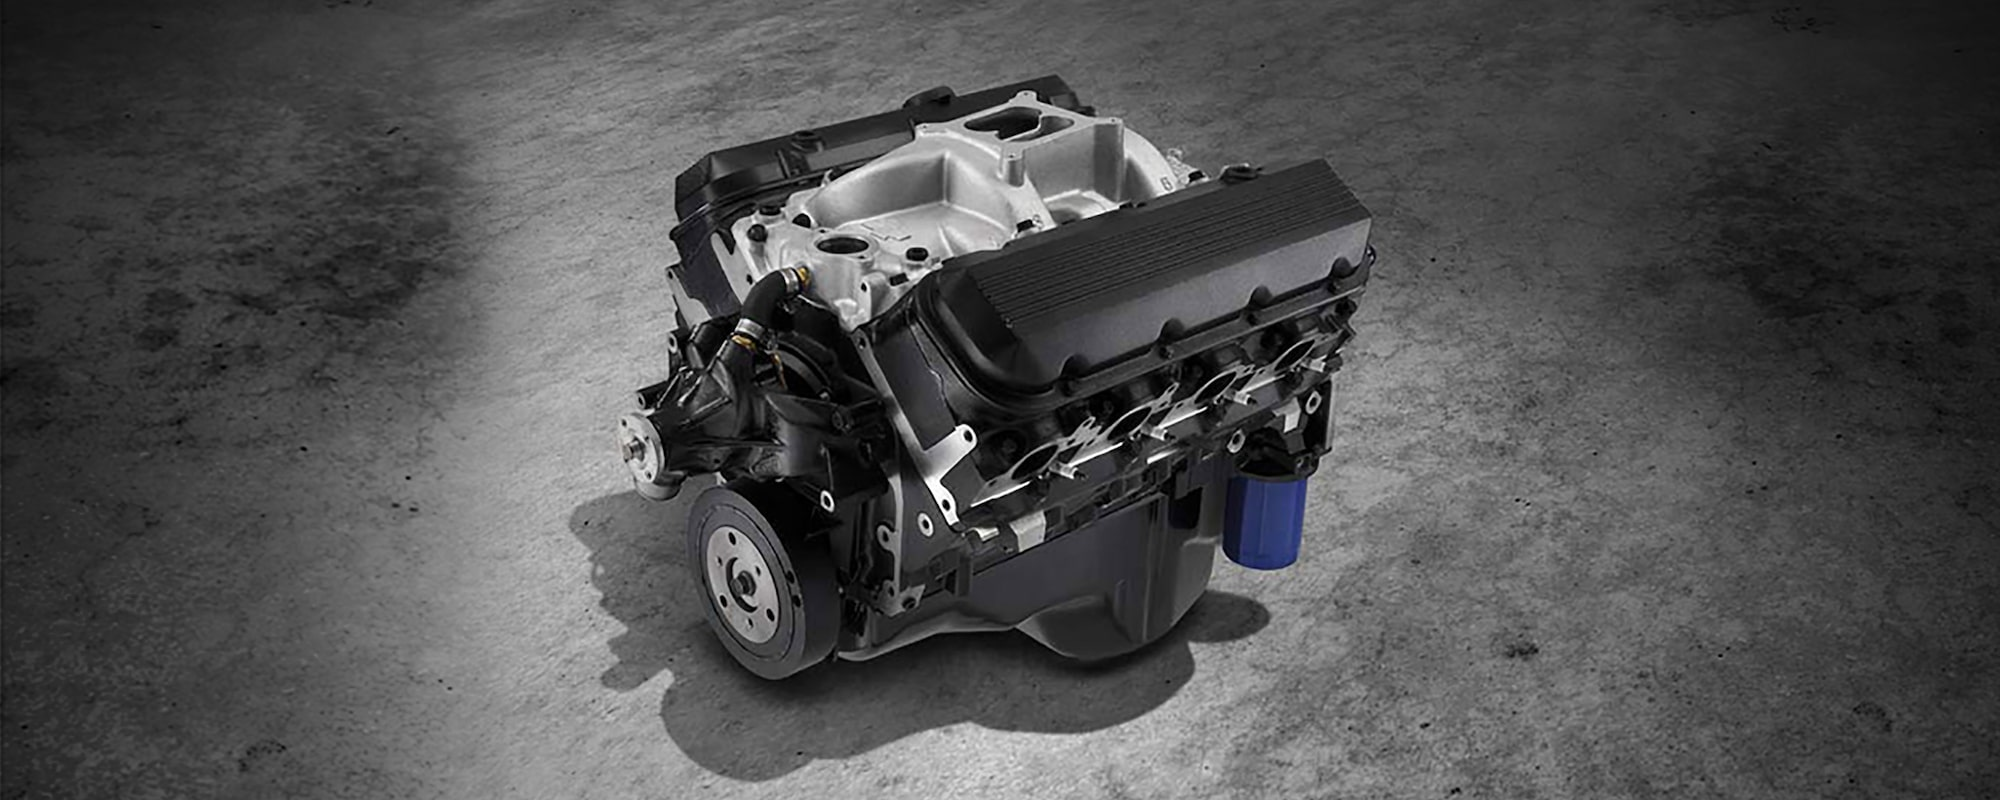 454 Cid Wiring Diagram Chevrolet Circuit Schematic Ig Chevy Impala Underhood Fuse Ho Big Block Crate Engine Performance Tail Light